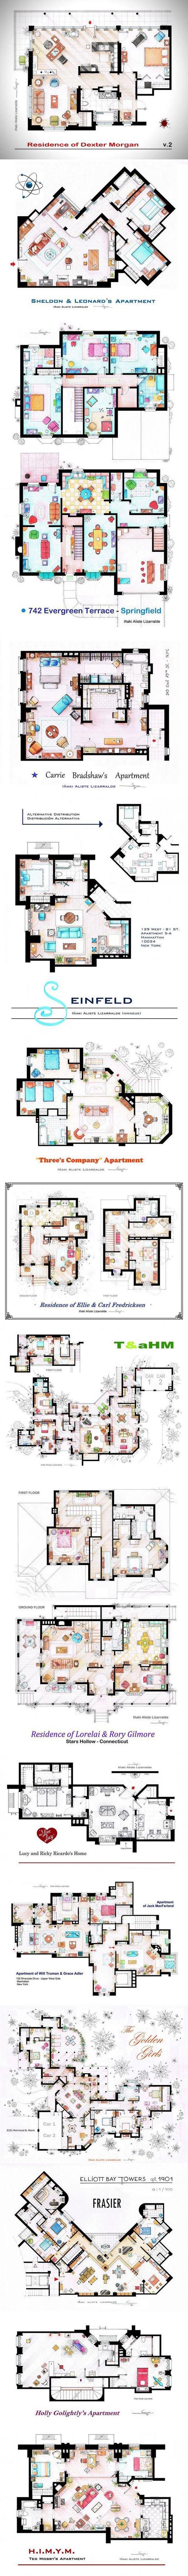 52 best sims 4 images on pinterest house blueprints home plans